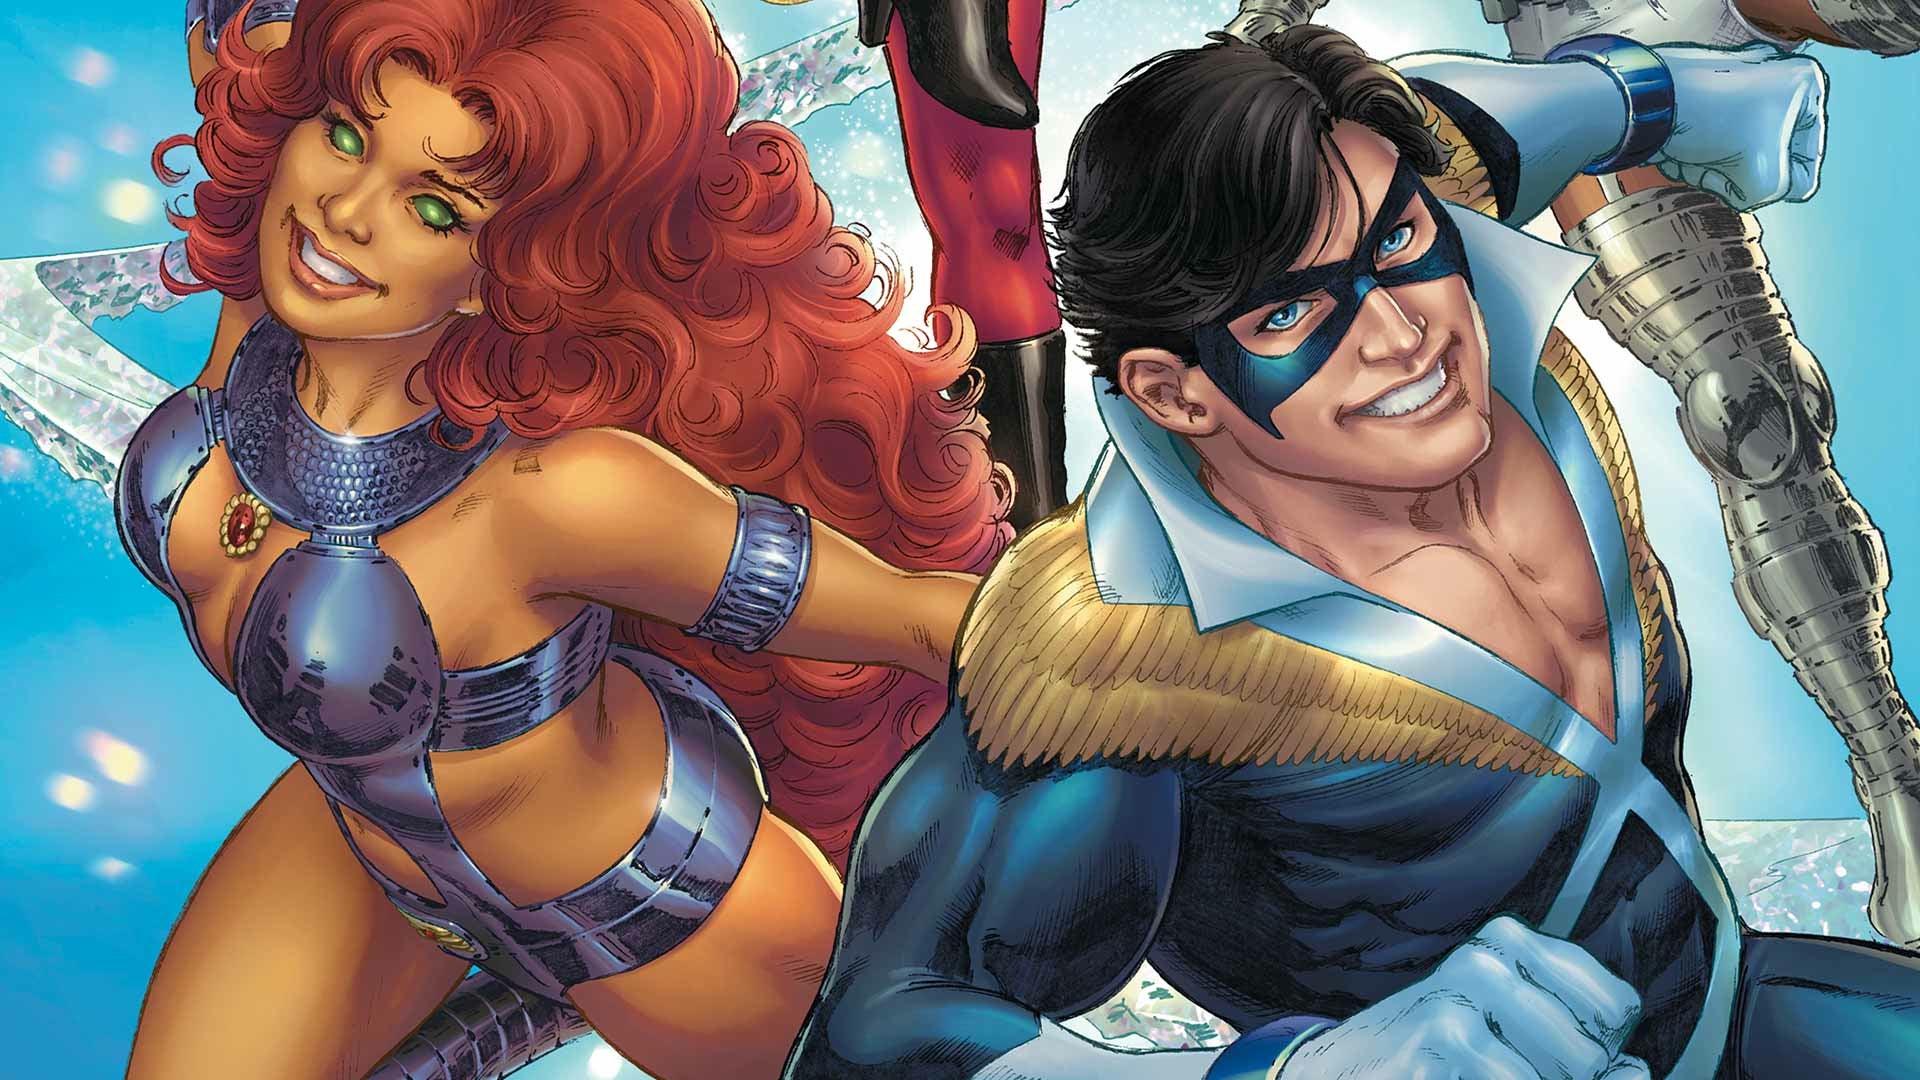 8 - Convergence - New Teen Titans